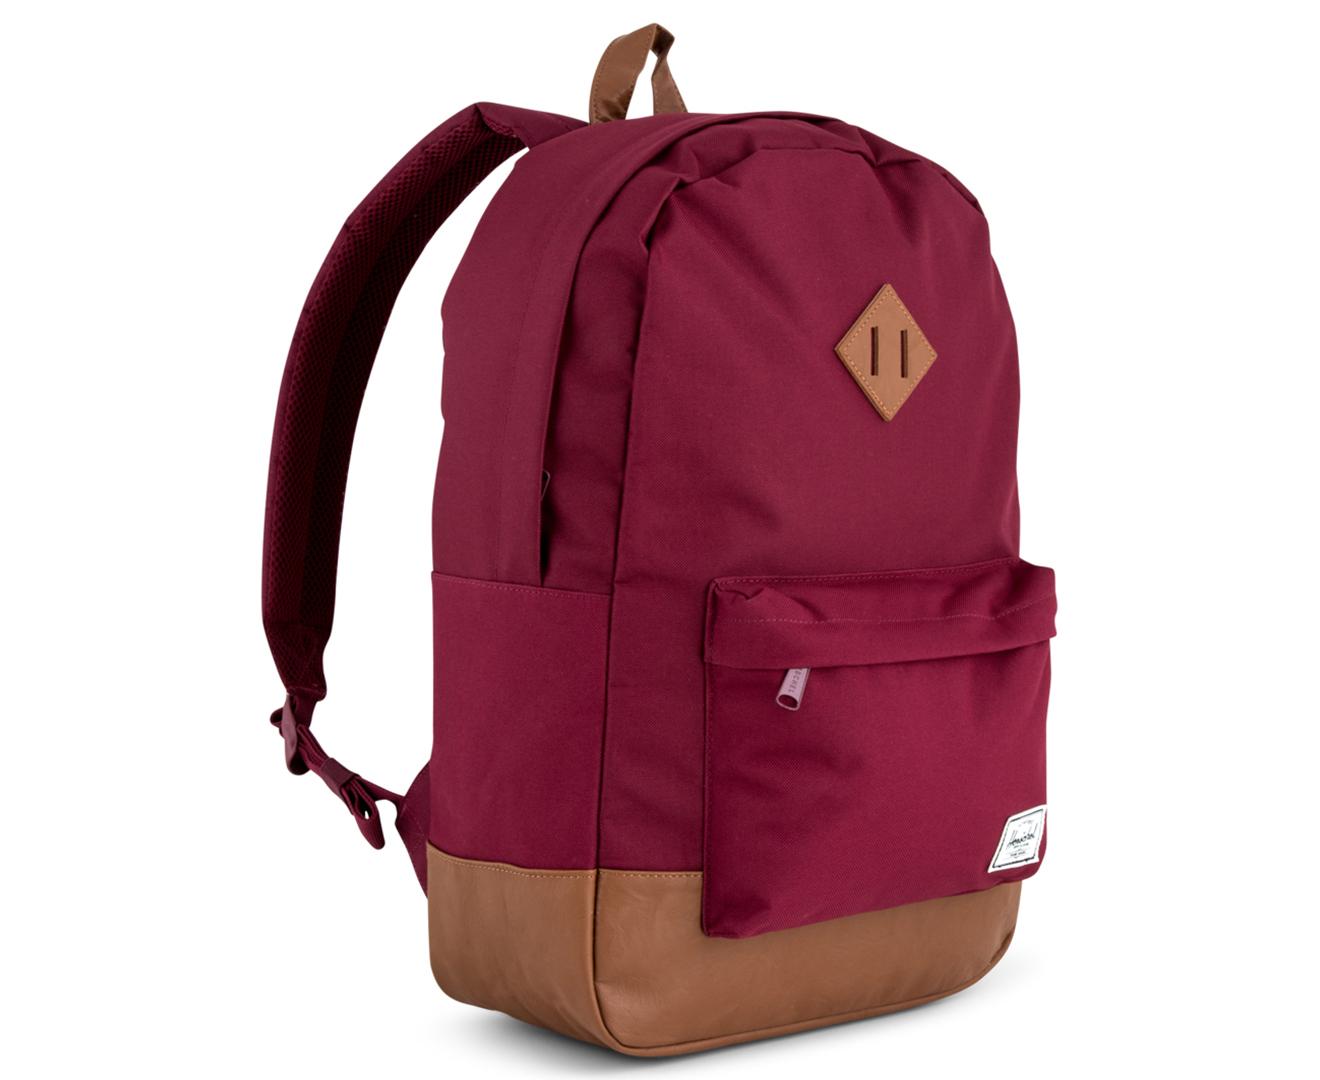 679db5c4136 Herschel Supply Co. 21.5L Heritage Backpack - Windsor Wine Tan ...